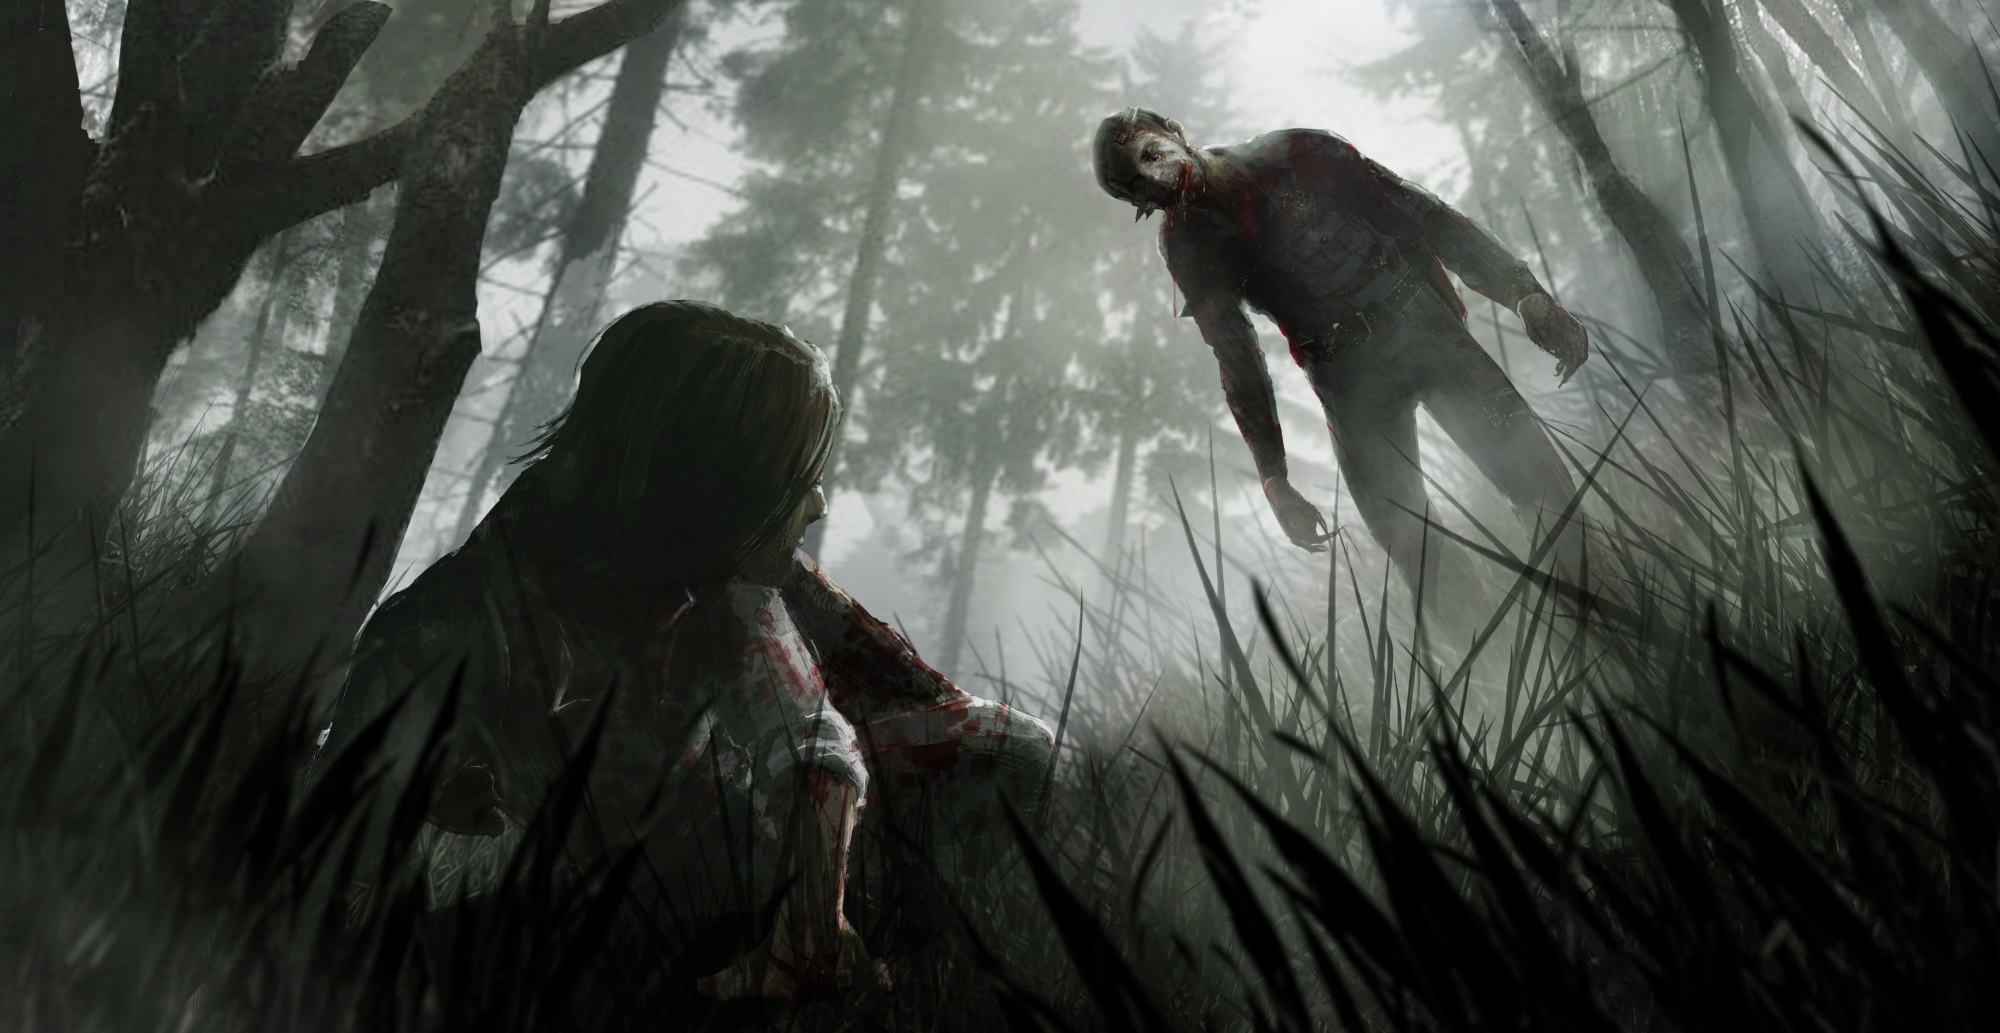 Artworky nových nepřátel v DLC do The Evil Within 106173